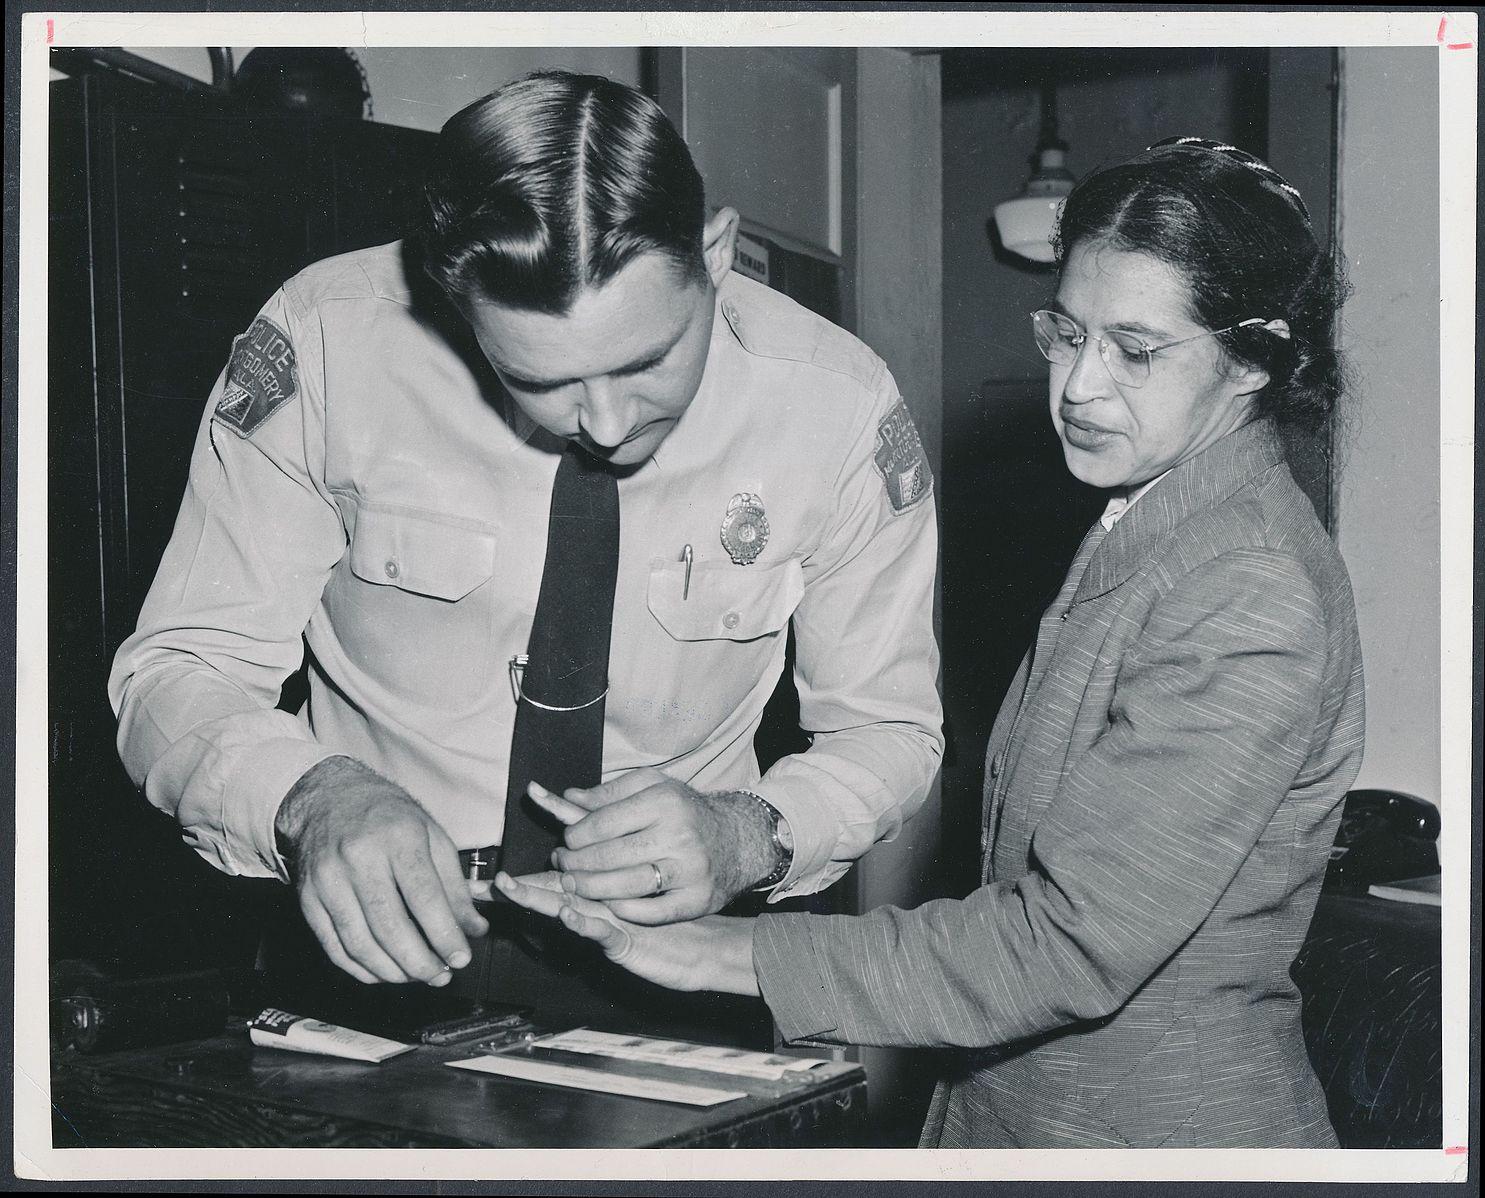 Rosa_Parks_being_fingerprinted_by_Deputy_Sheriff_D.H._Lackey_after_being_arrested_for_boycotting_public_transportation_-_Original.jpg